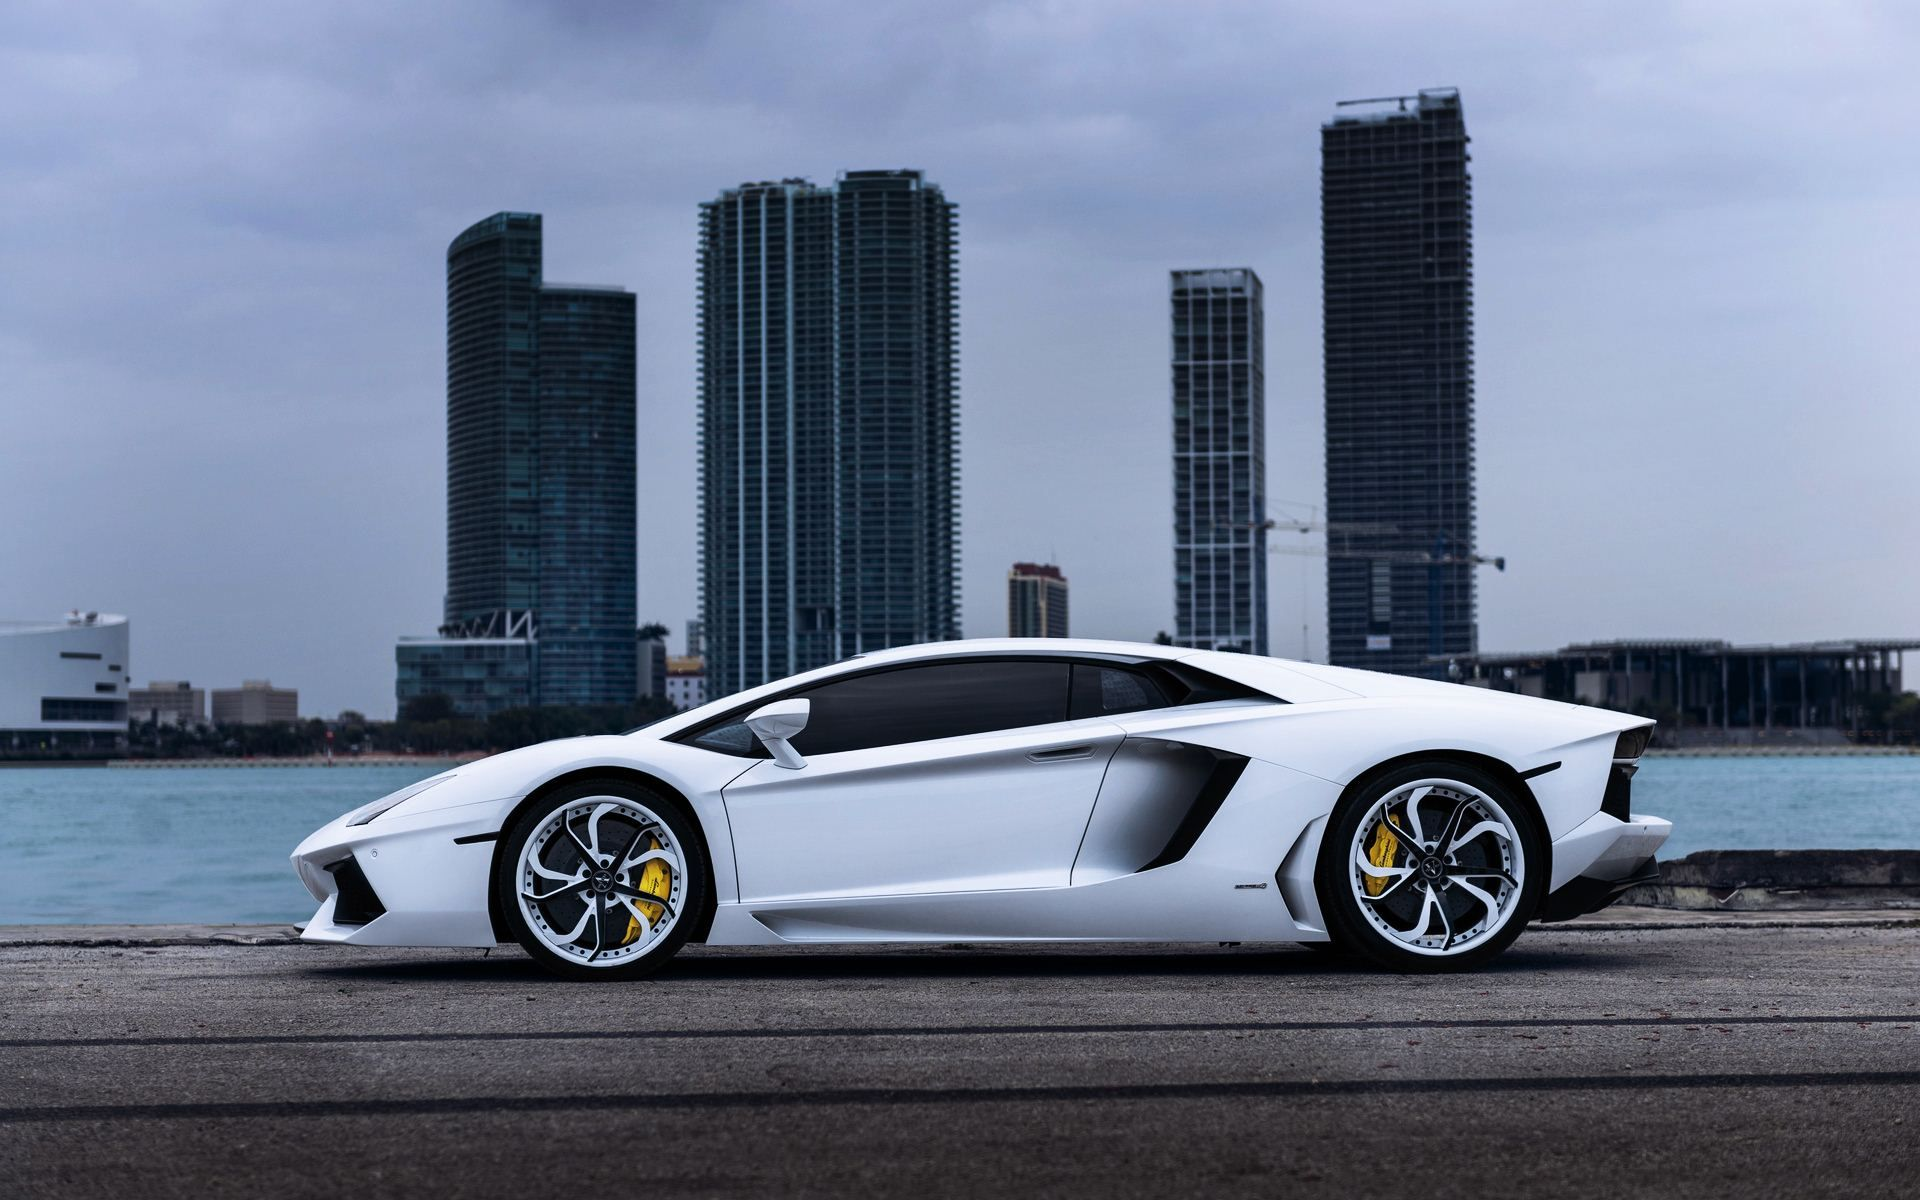 37ba271aa23c6e9ccc704b8f4b009a94 Exciting Lamborghini Huracán Lp 610-4 Cena Cars Trend